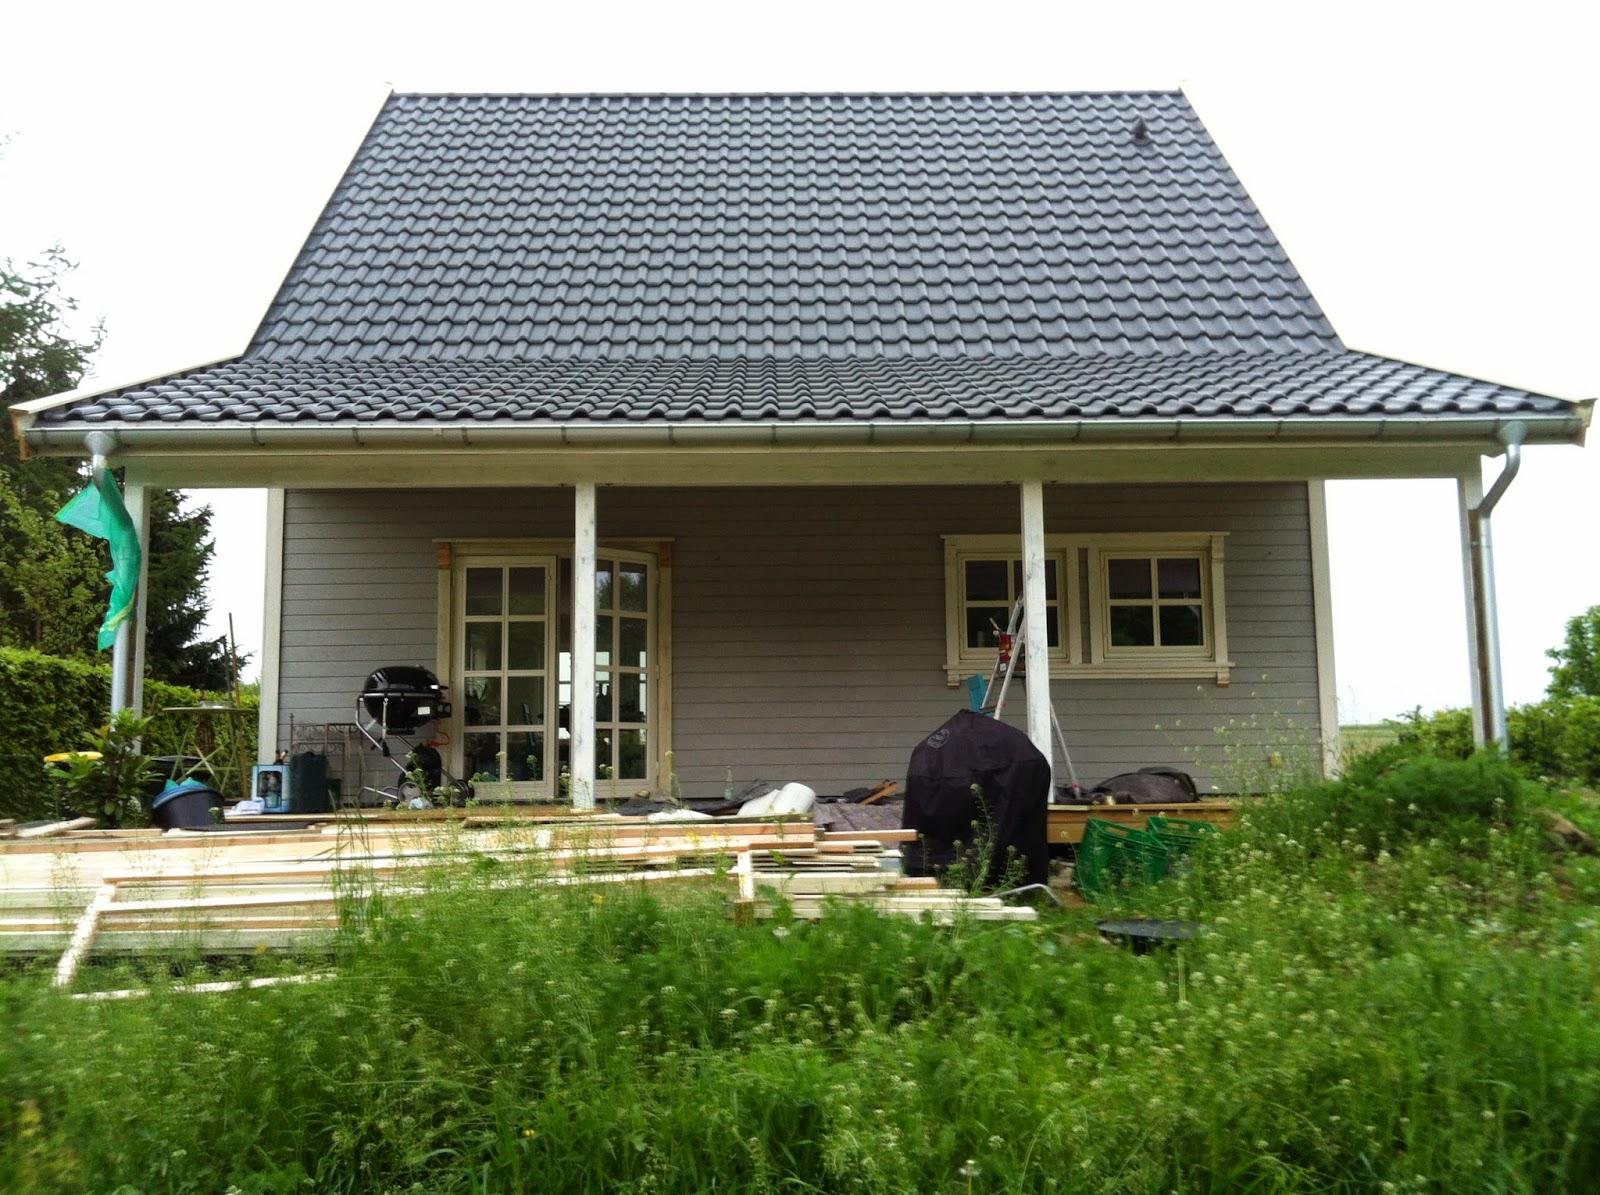 norwegian dreamhome das gro e pinselschwingen beginnt. Black Bedroom Furniture Sets. Home Design Ideas